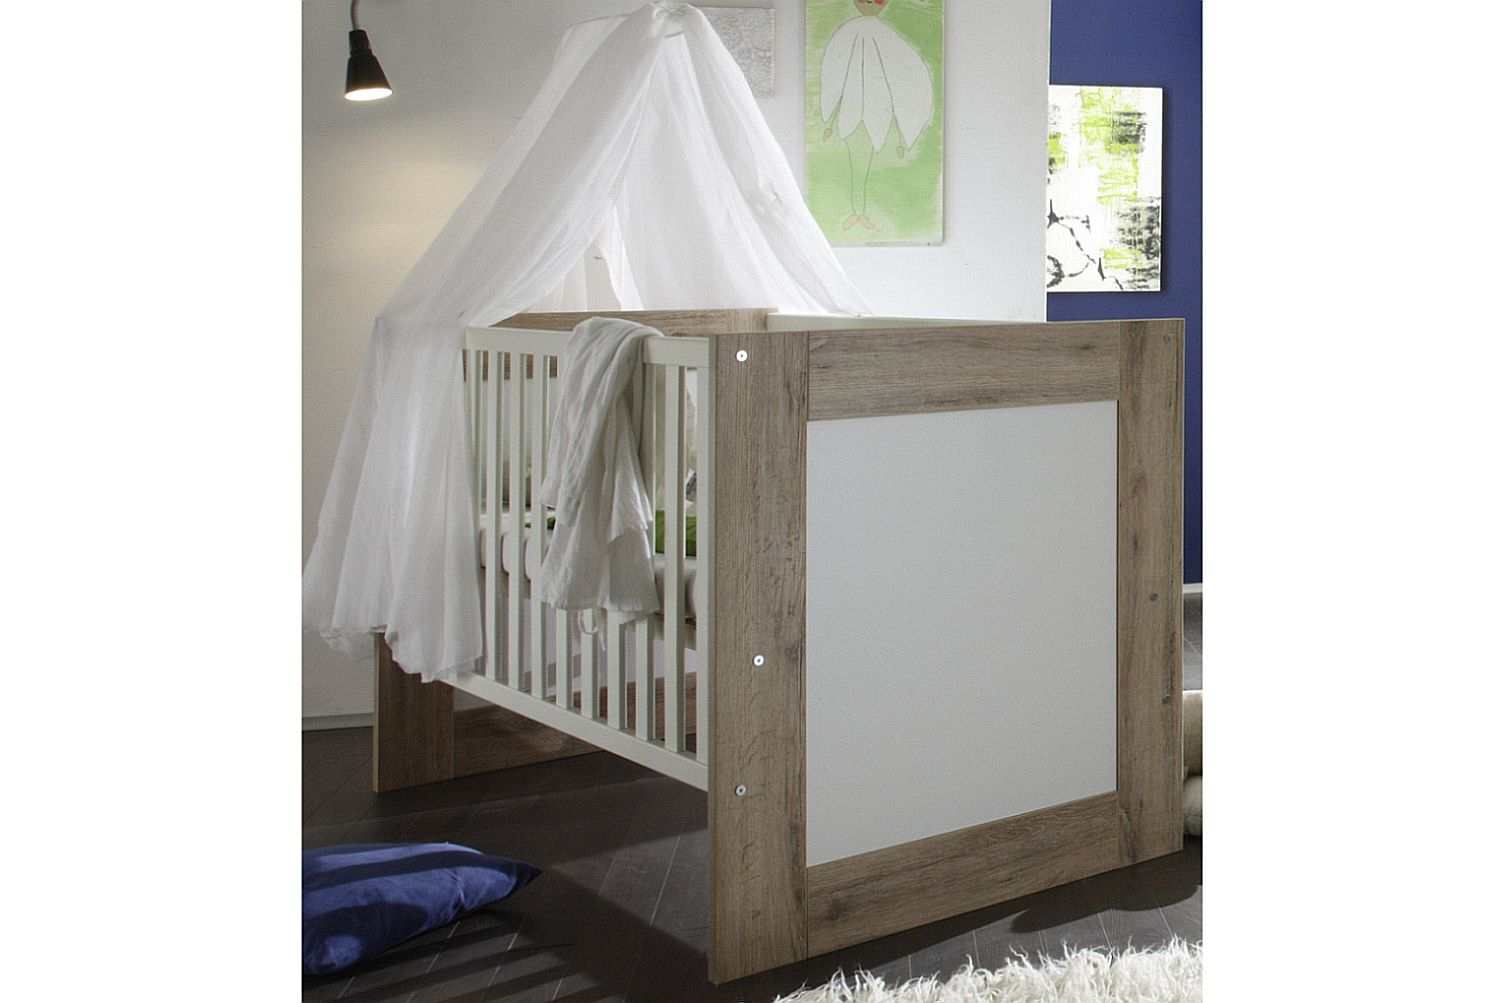 kinderbett bett babybett gitterbett umbaubar erweiterbar. Black Bedroom Furniture Sets. Home Design Ideas